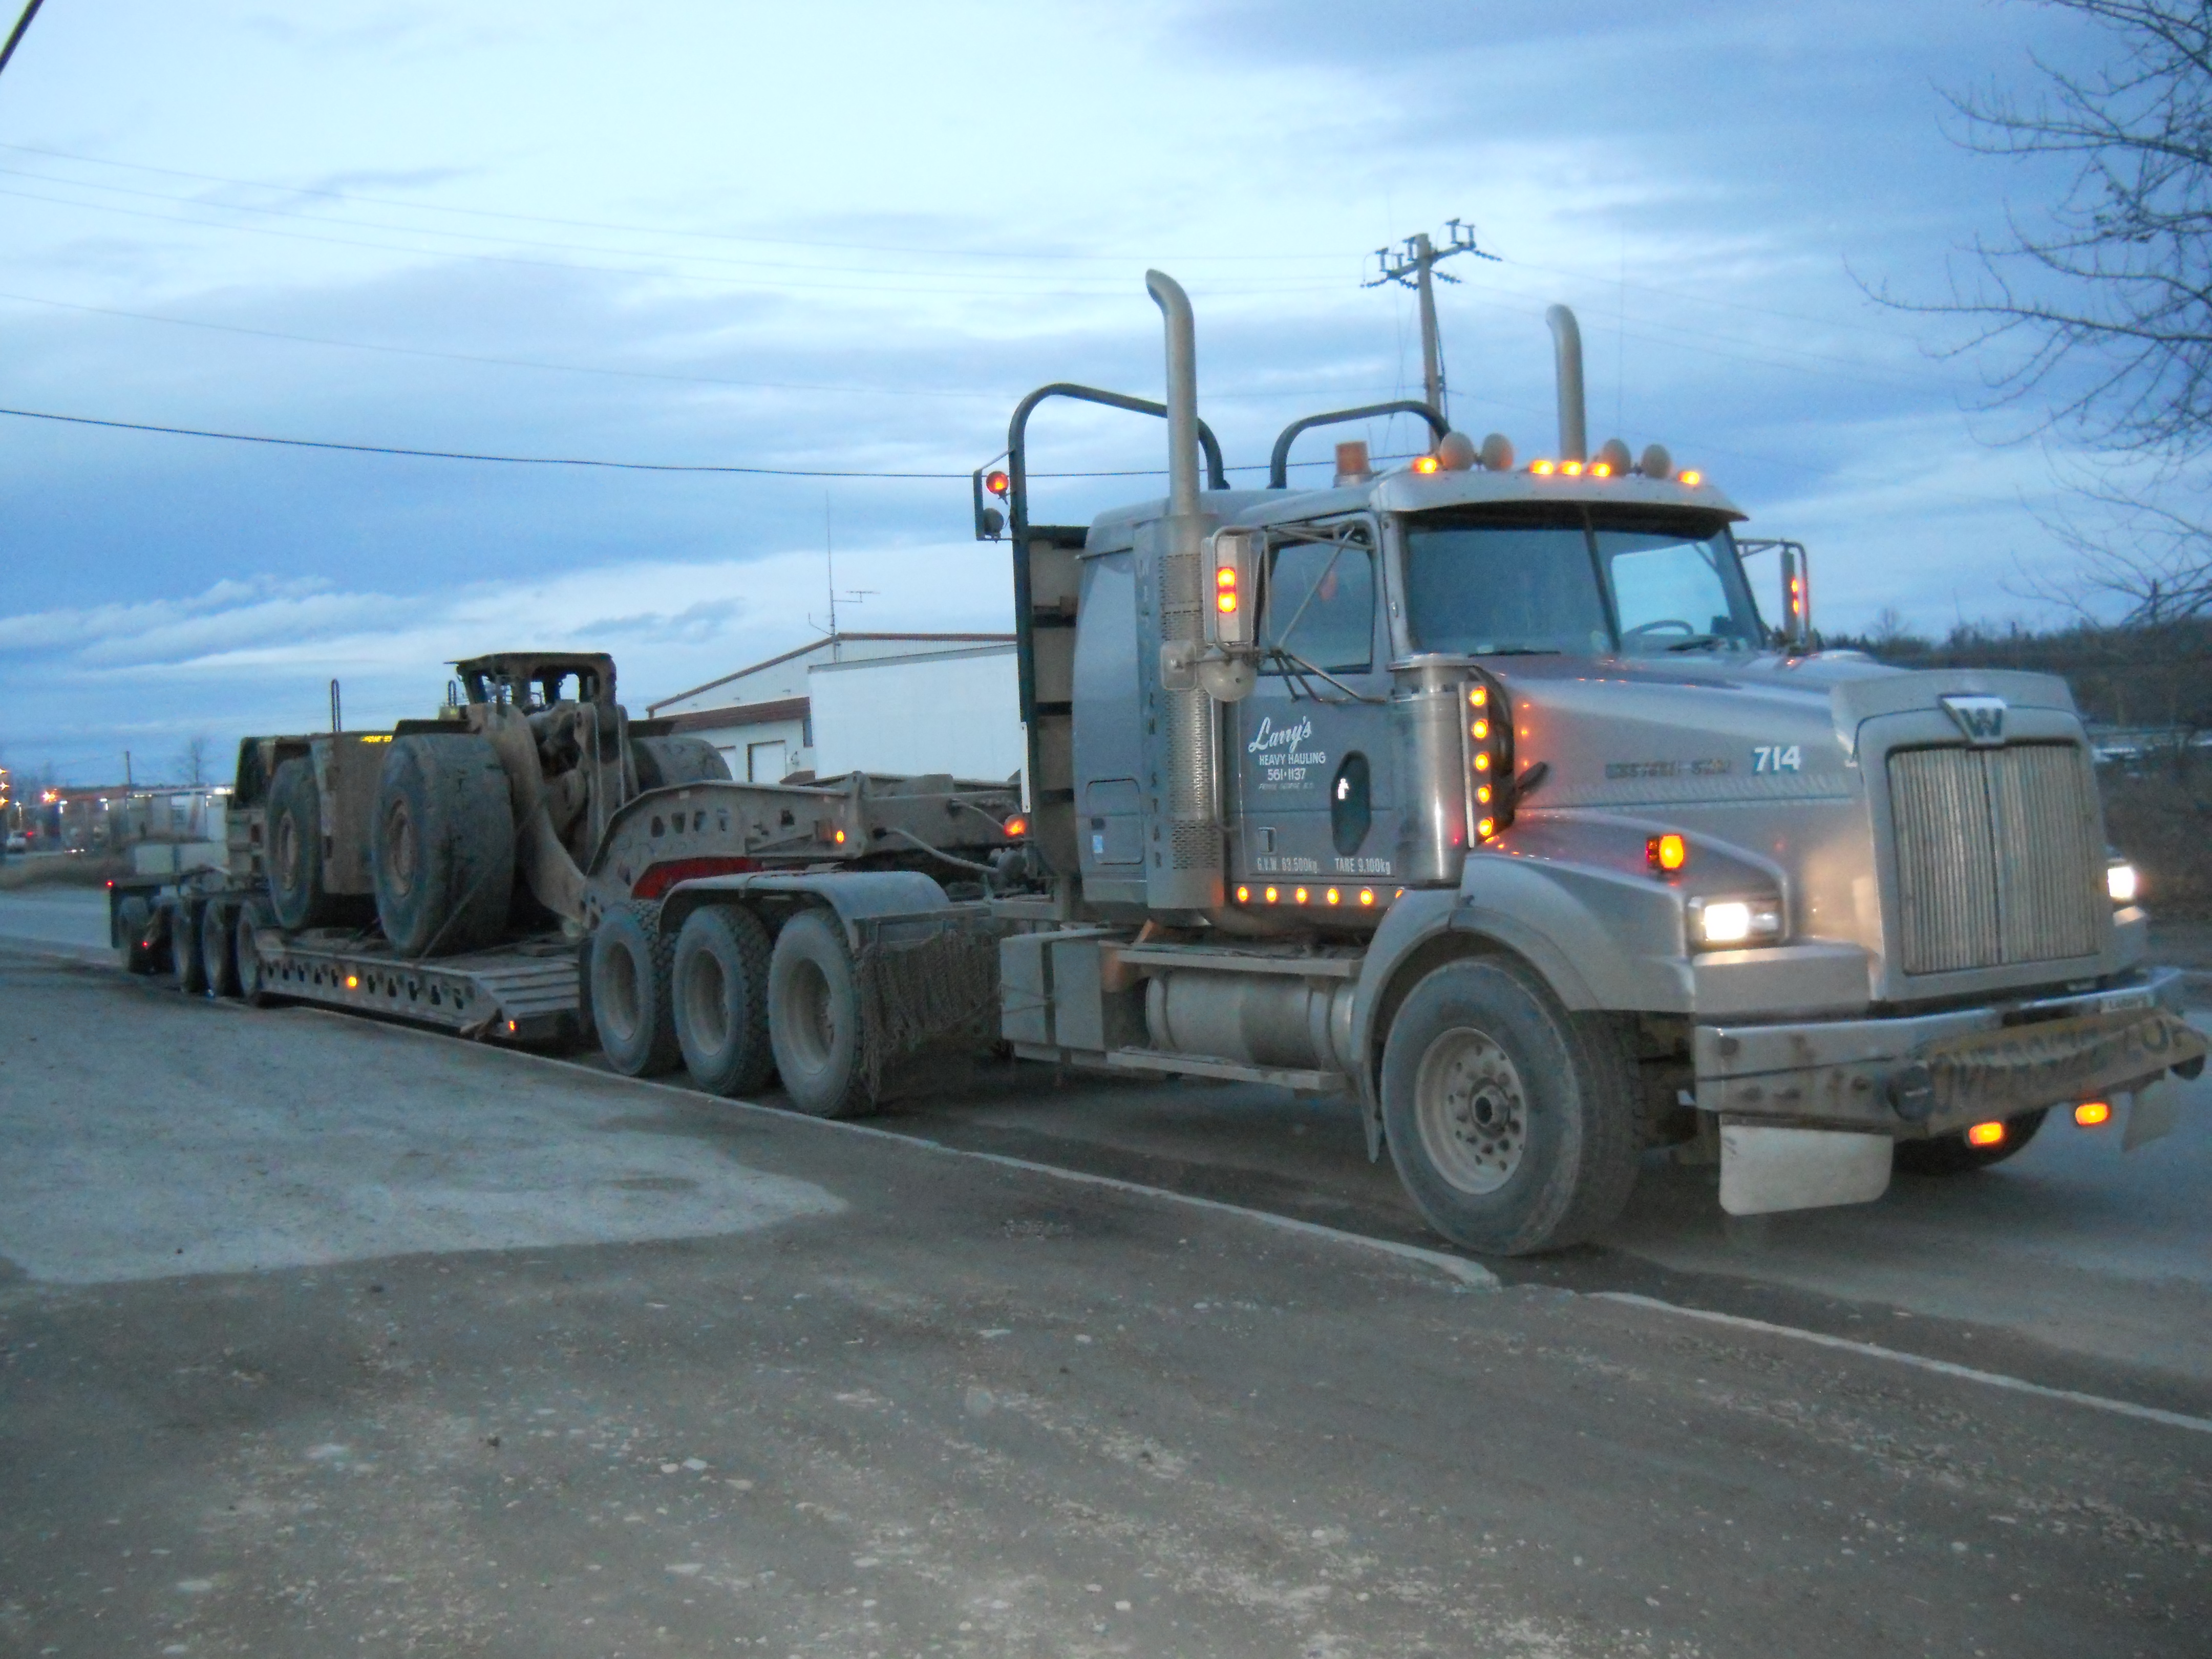 714 mine truck